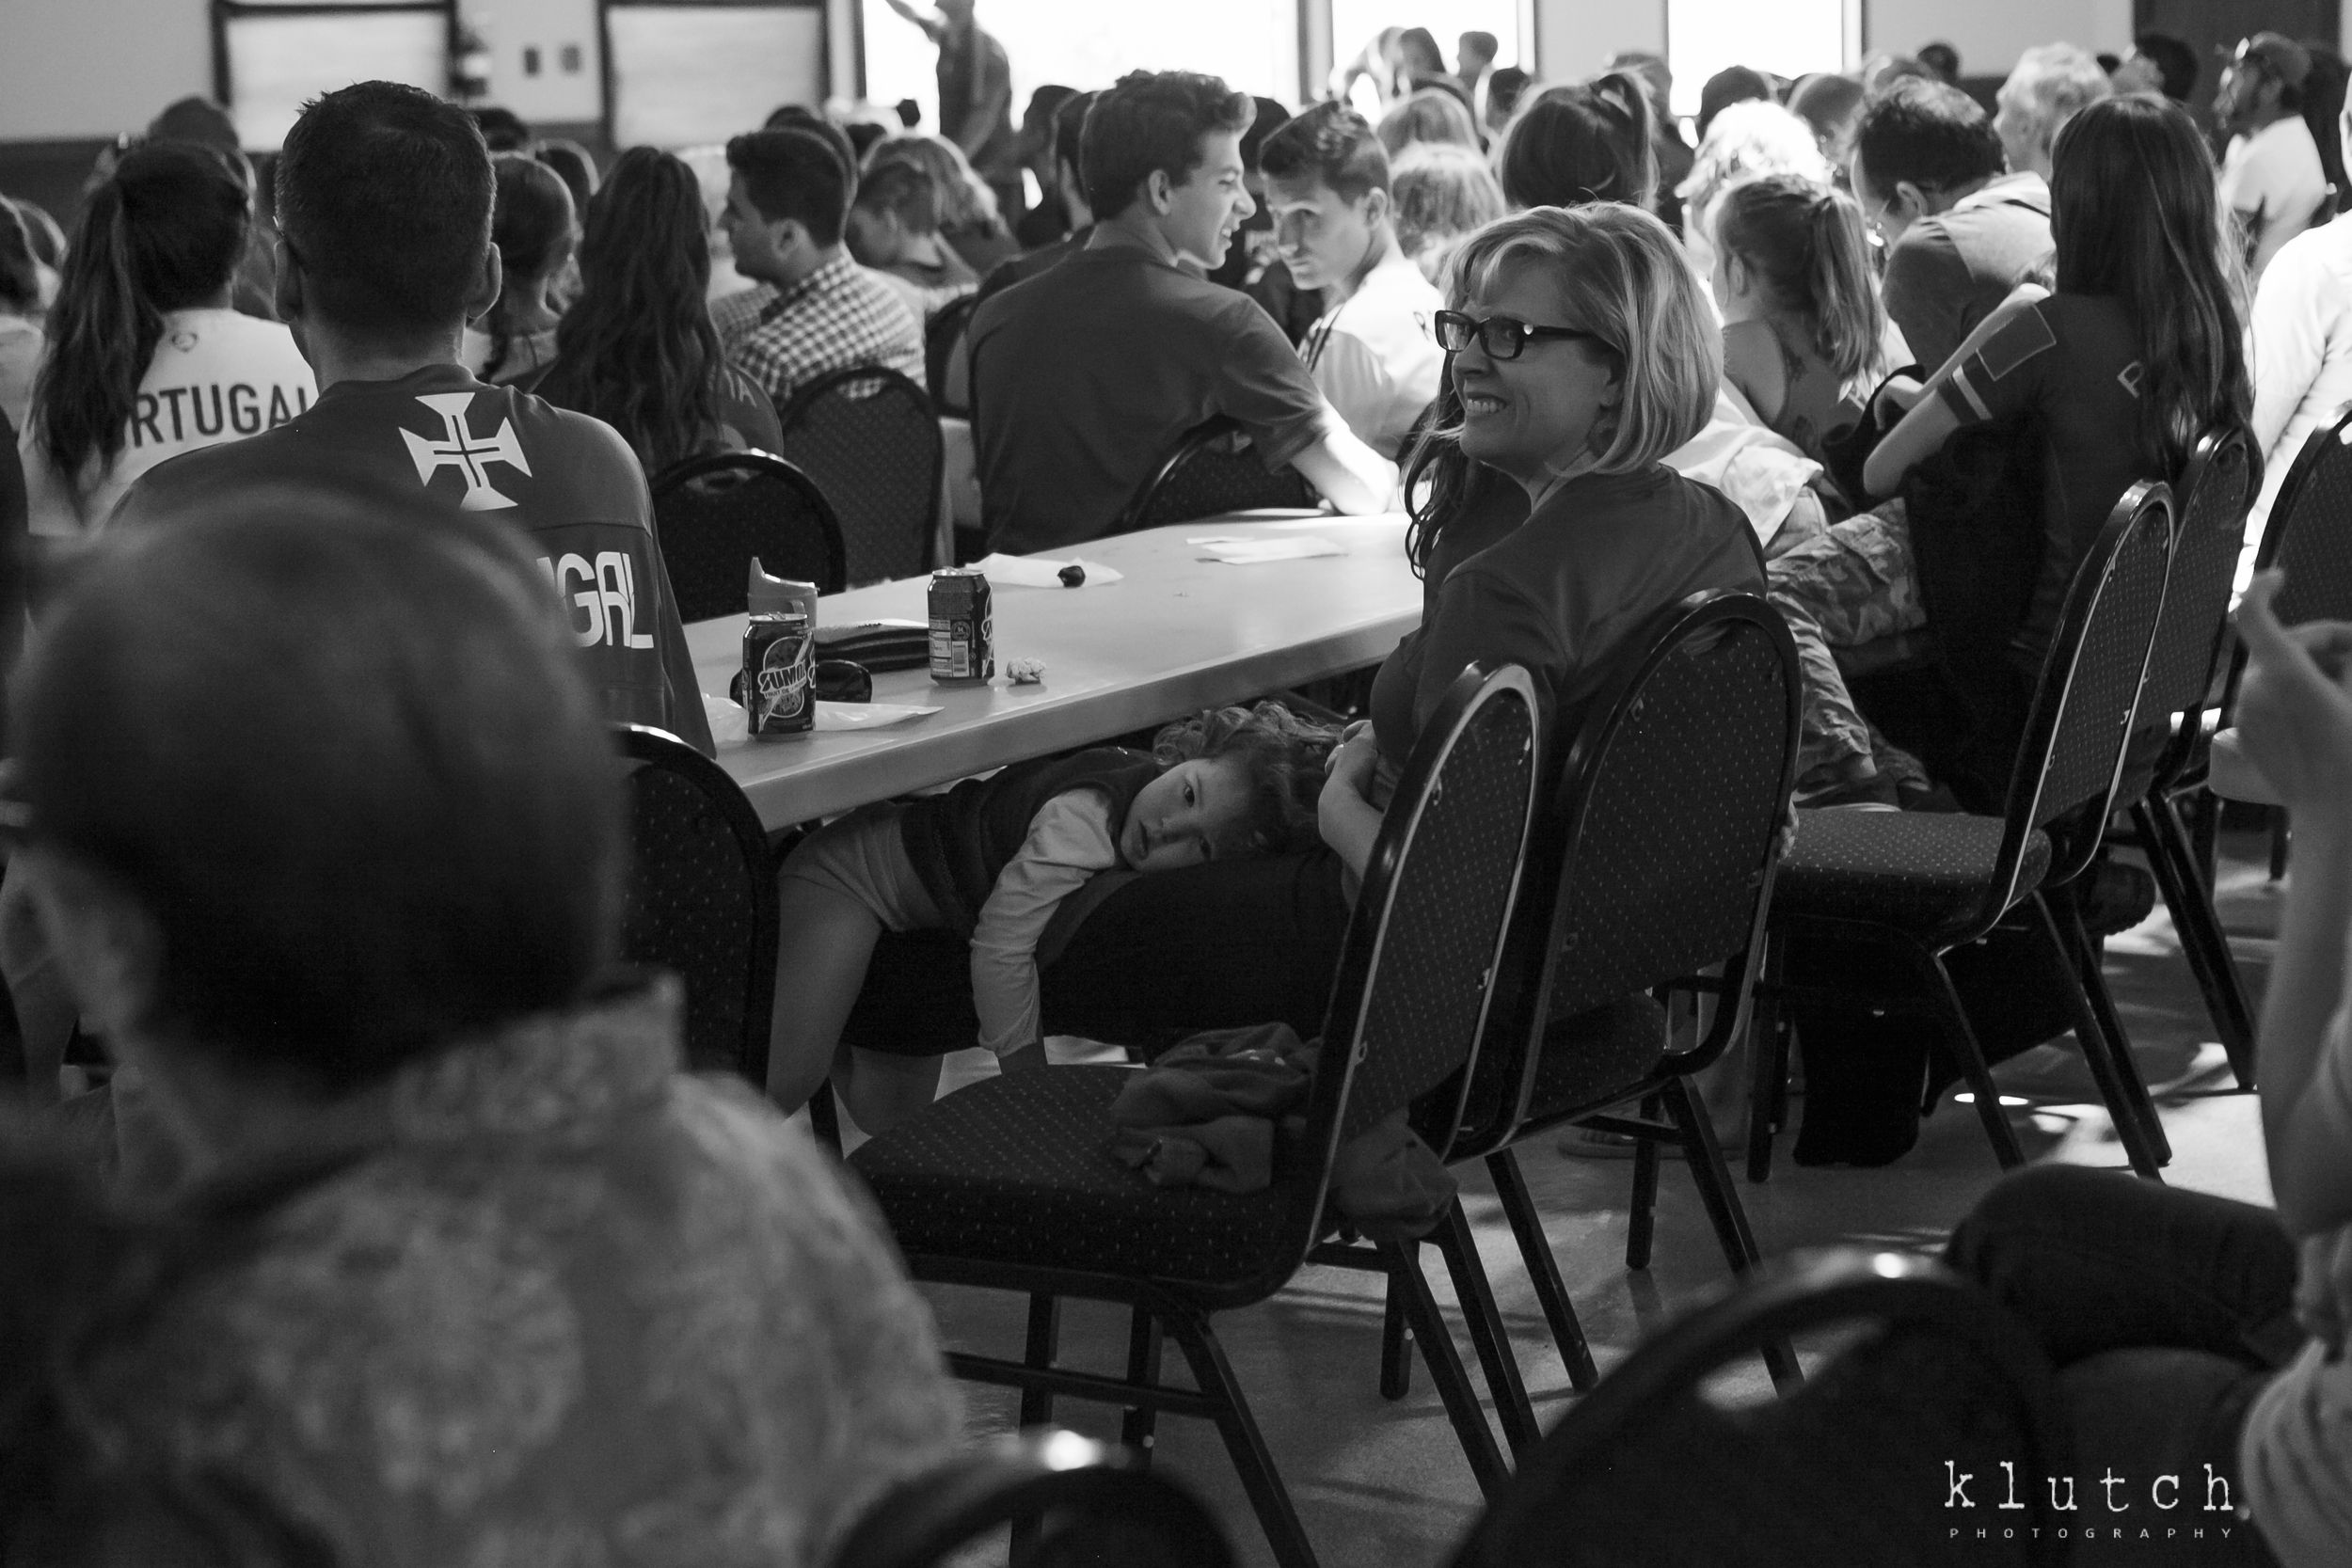 Klutch Photography, vancouver family photographer, surrey family photographer, vancouver newnorn photographer, surrey newborn photographer, candid photography, lifestlye photography, lifeunscripted photographer, -2-8.jpg